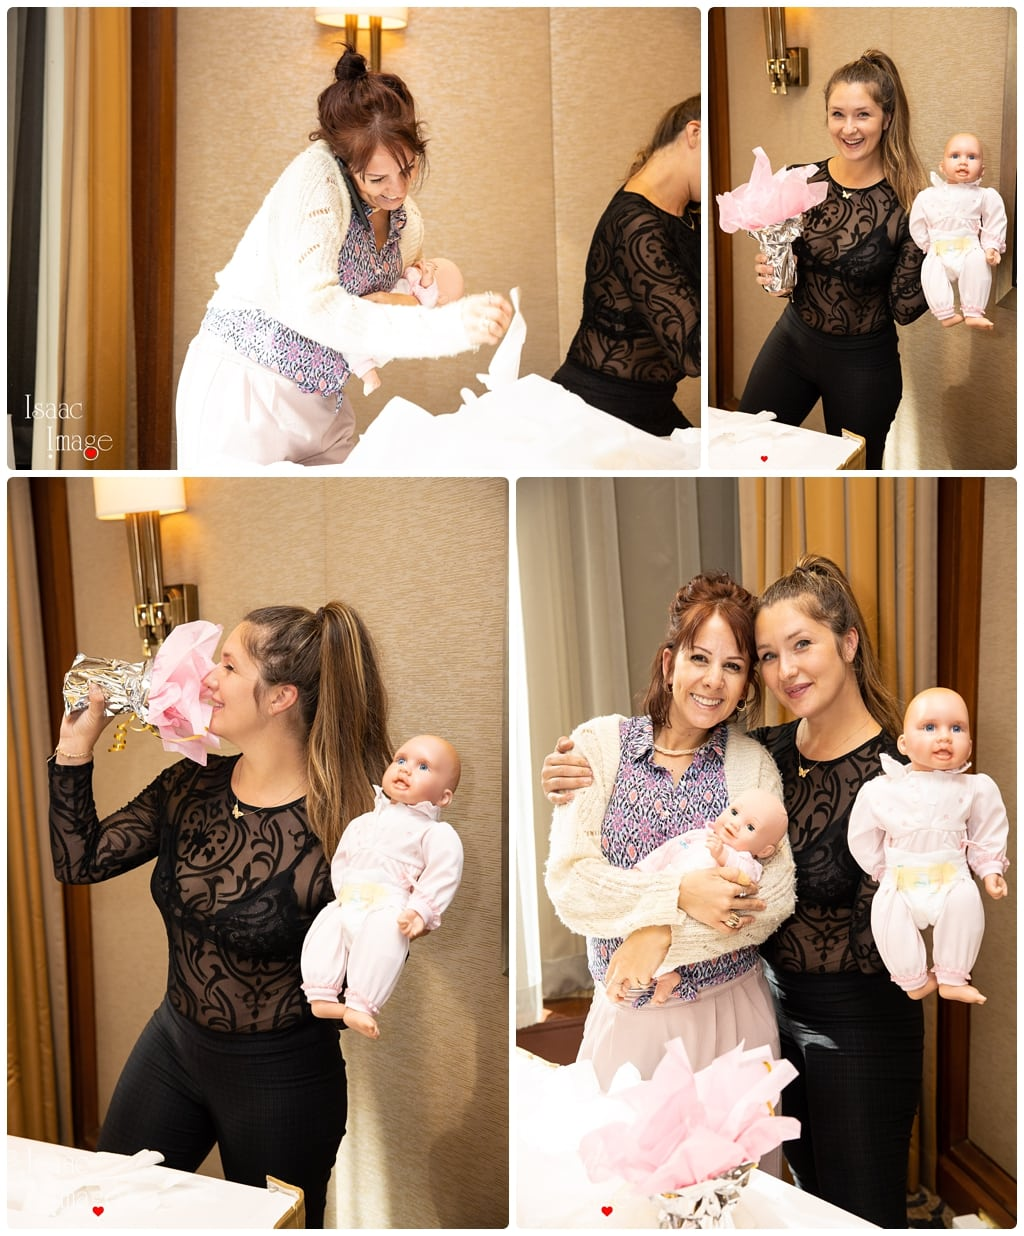 Baby shower_8857.jpg